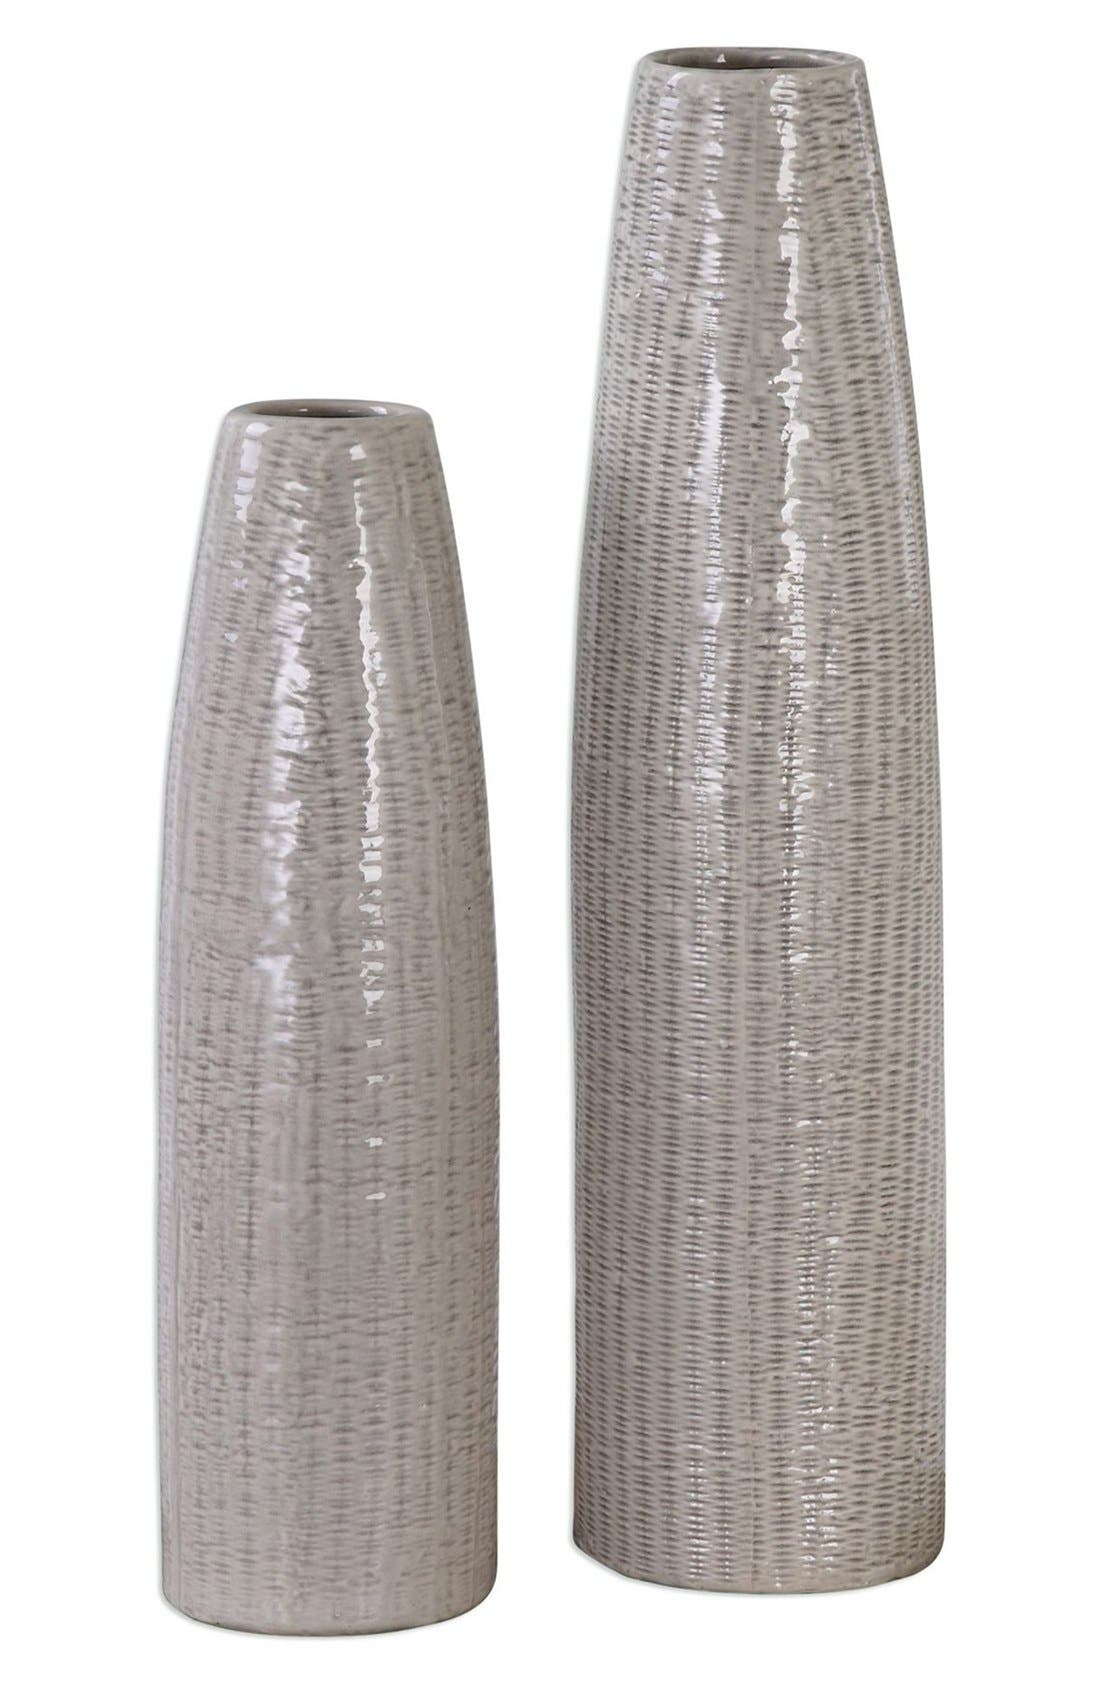 Textured Ceramic Vases,                             Main thumbnail 1, color,